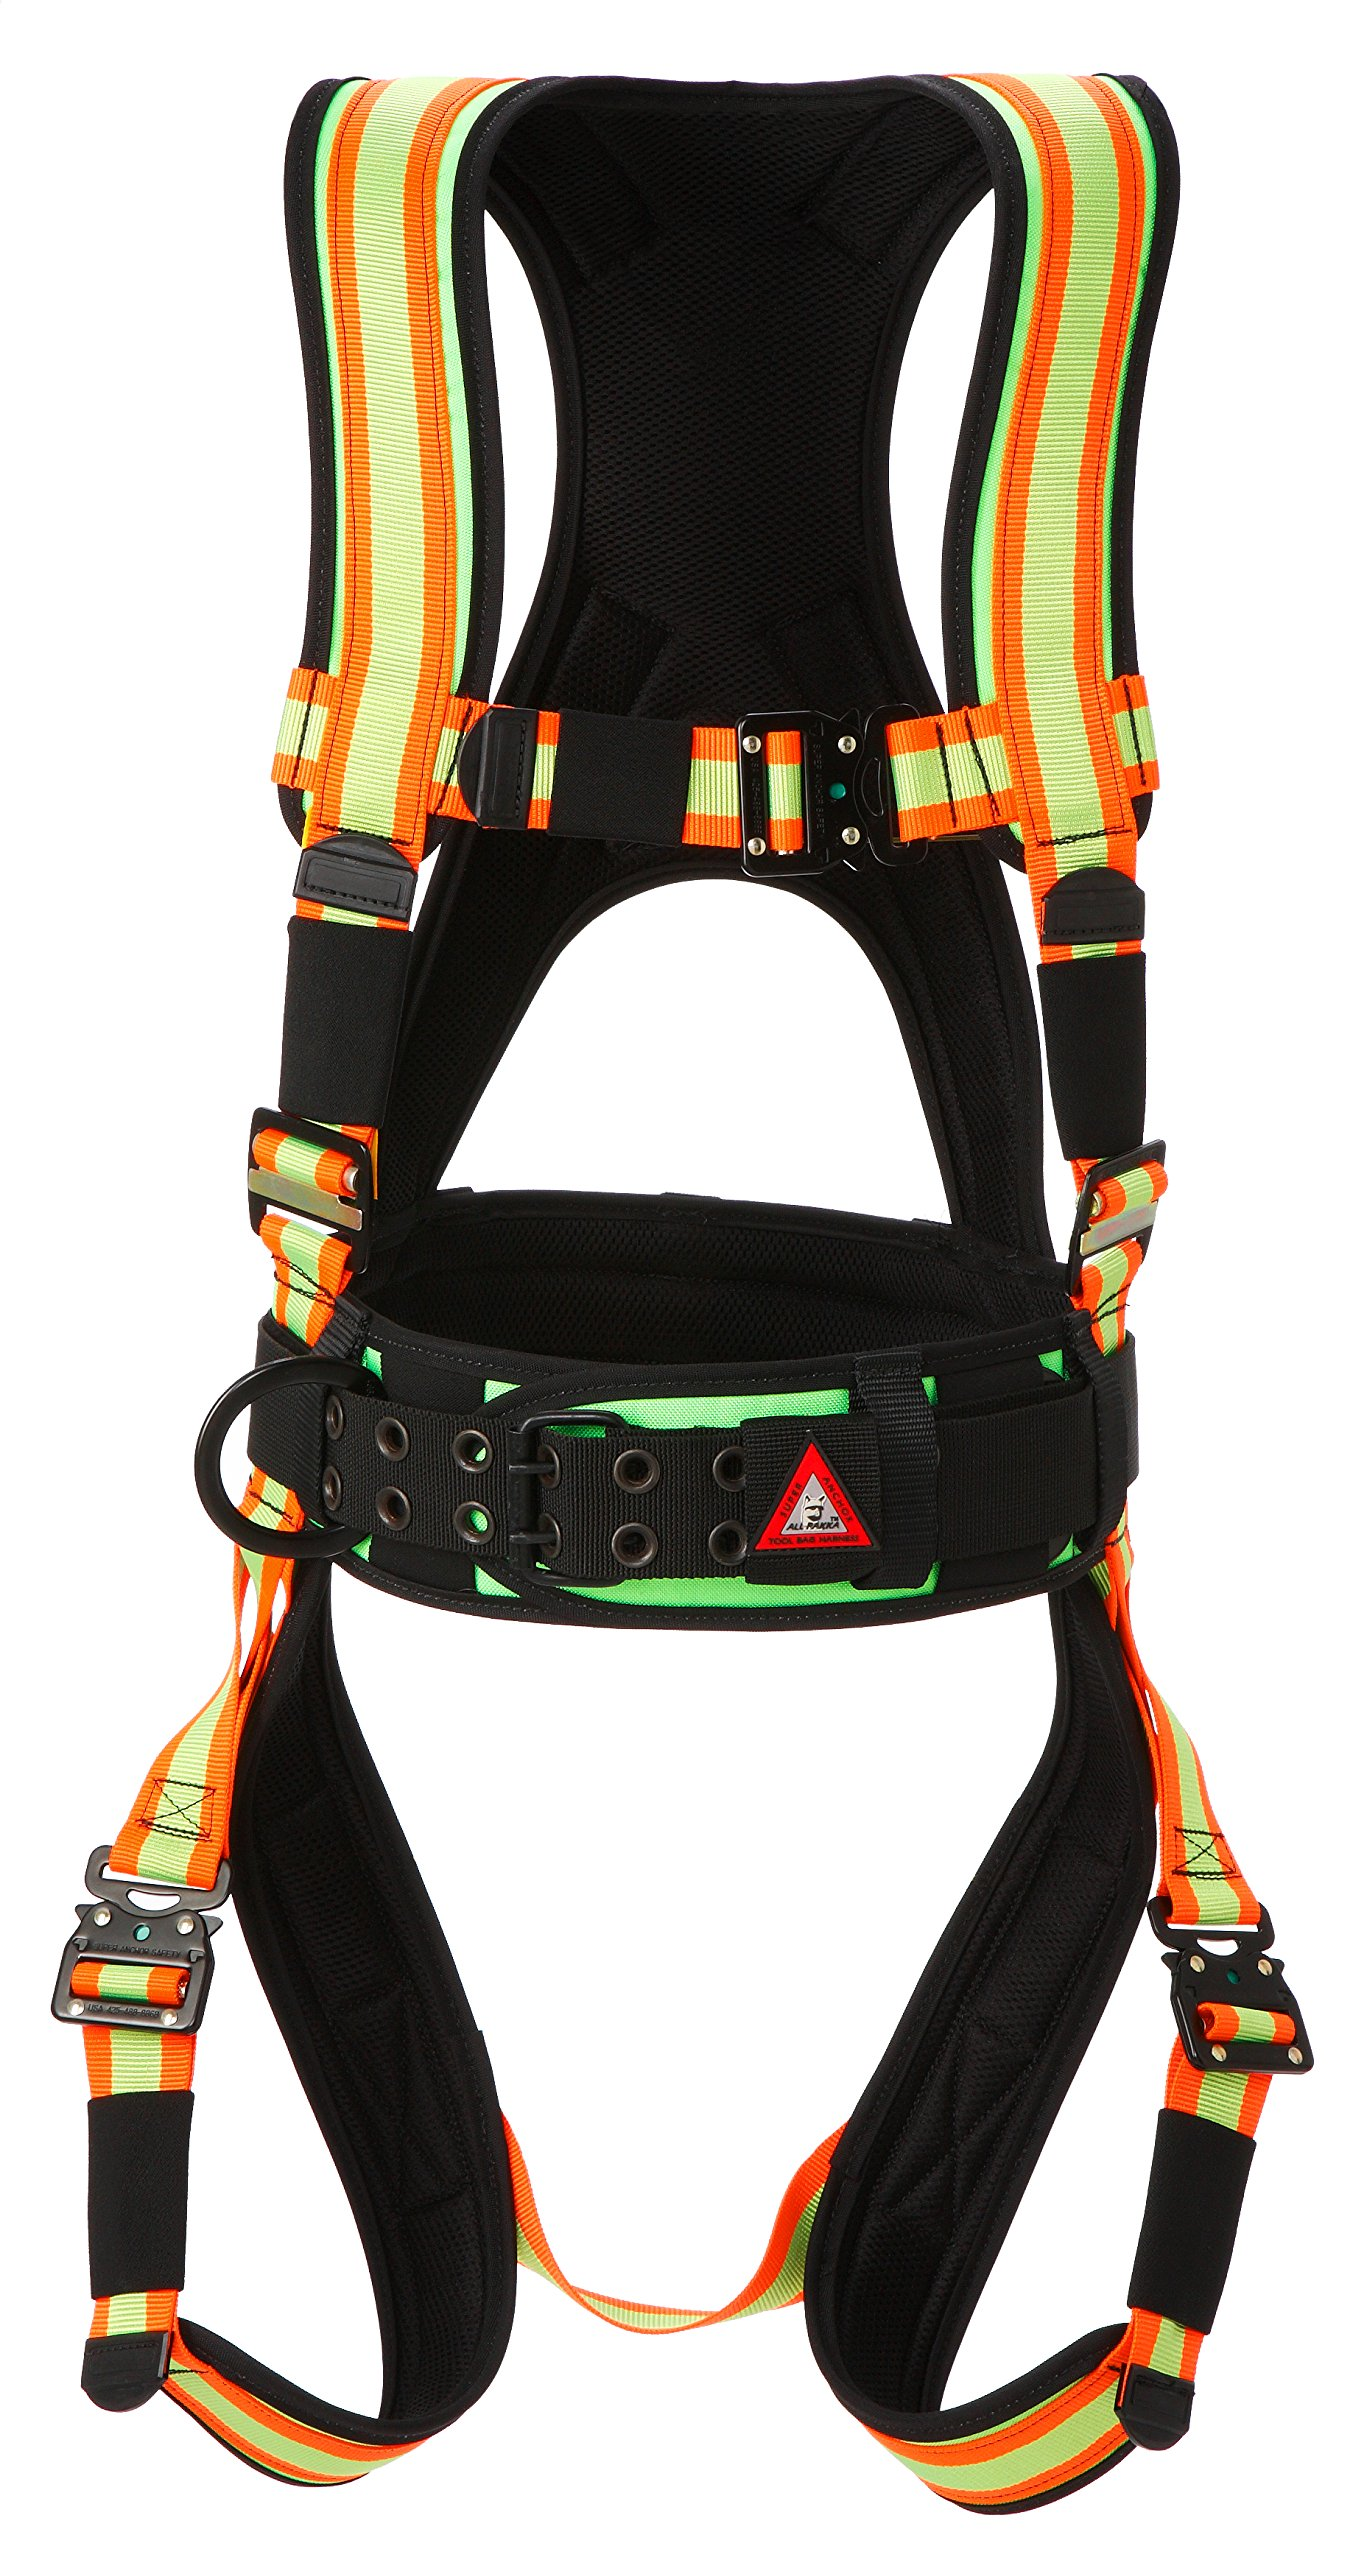 Super Anchor Safety 6101-HM Deluxe Full Body Harness, Medium, Hi-Viz